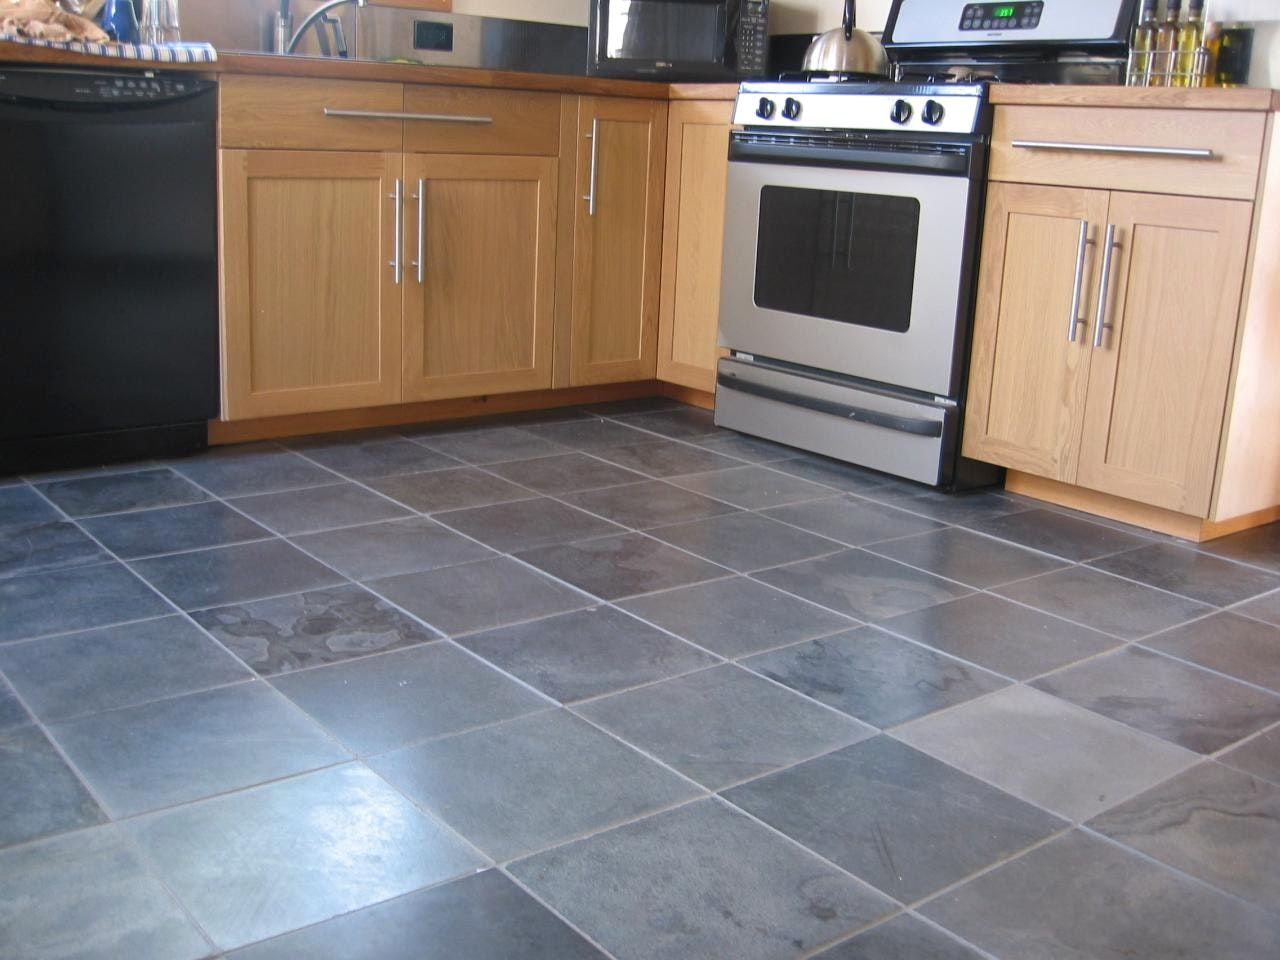 Laminate tile that looks like slate/stone/ceramic tile